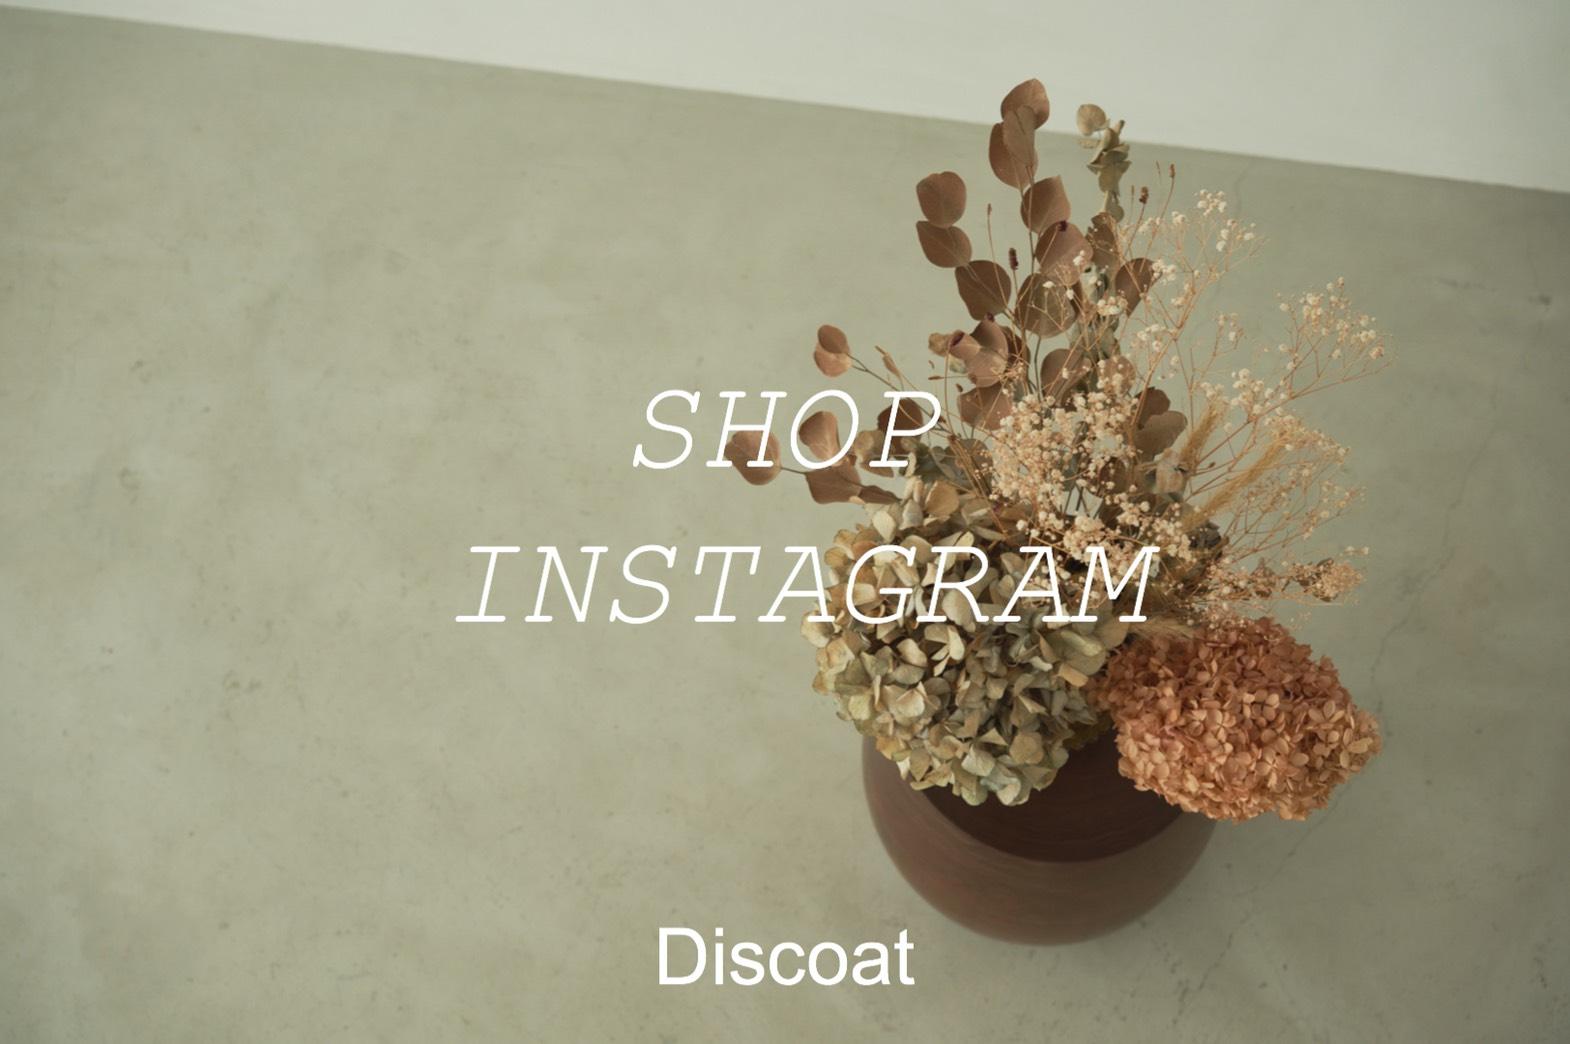 Discoat 店舗インスタグラムSTART!!